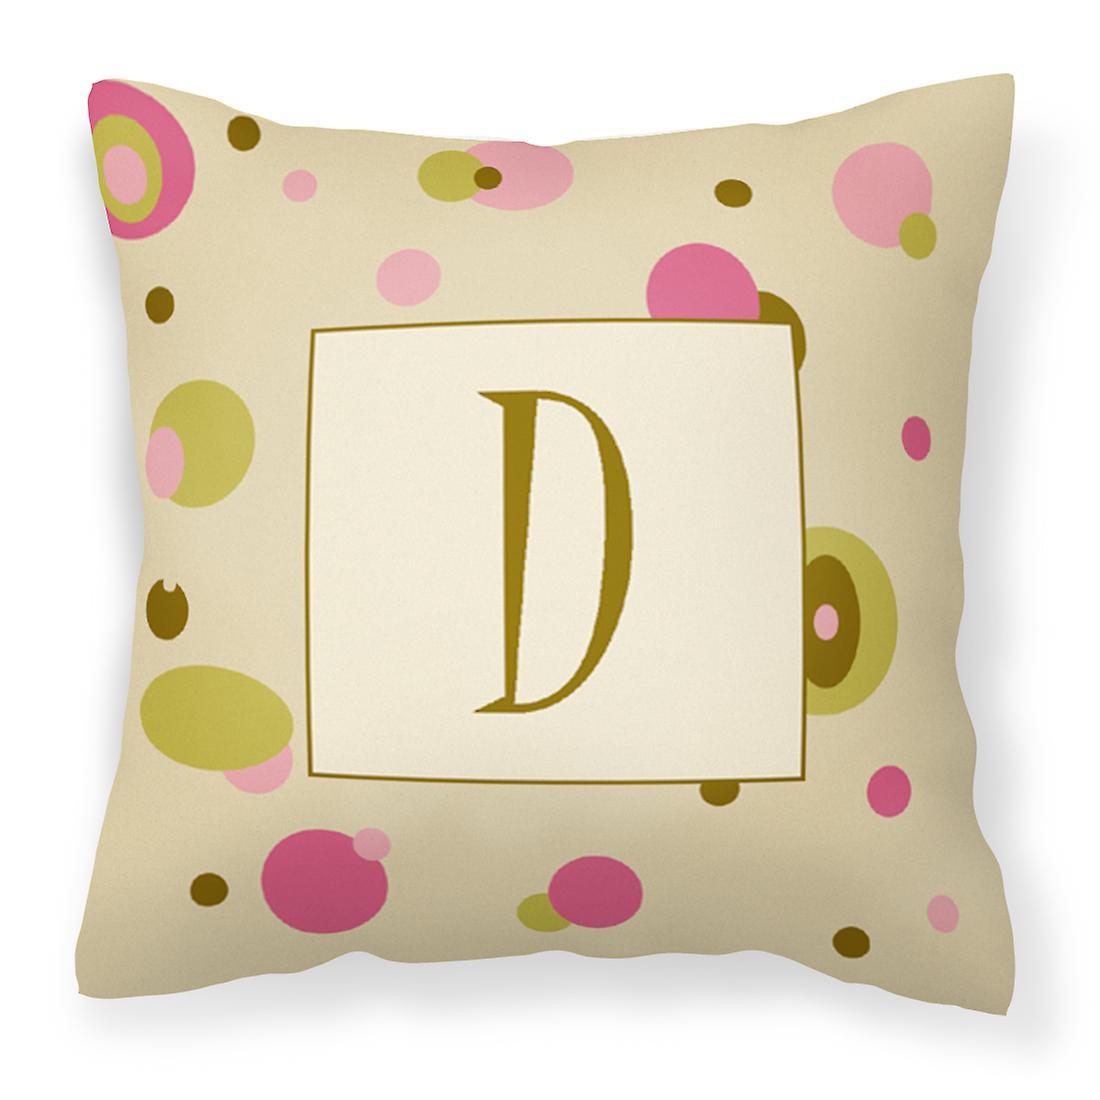 Monogramme D InitialeTan Décoratifs Toile Points Tissu Lettre Oreiller uOPkZiX